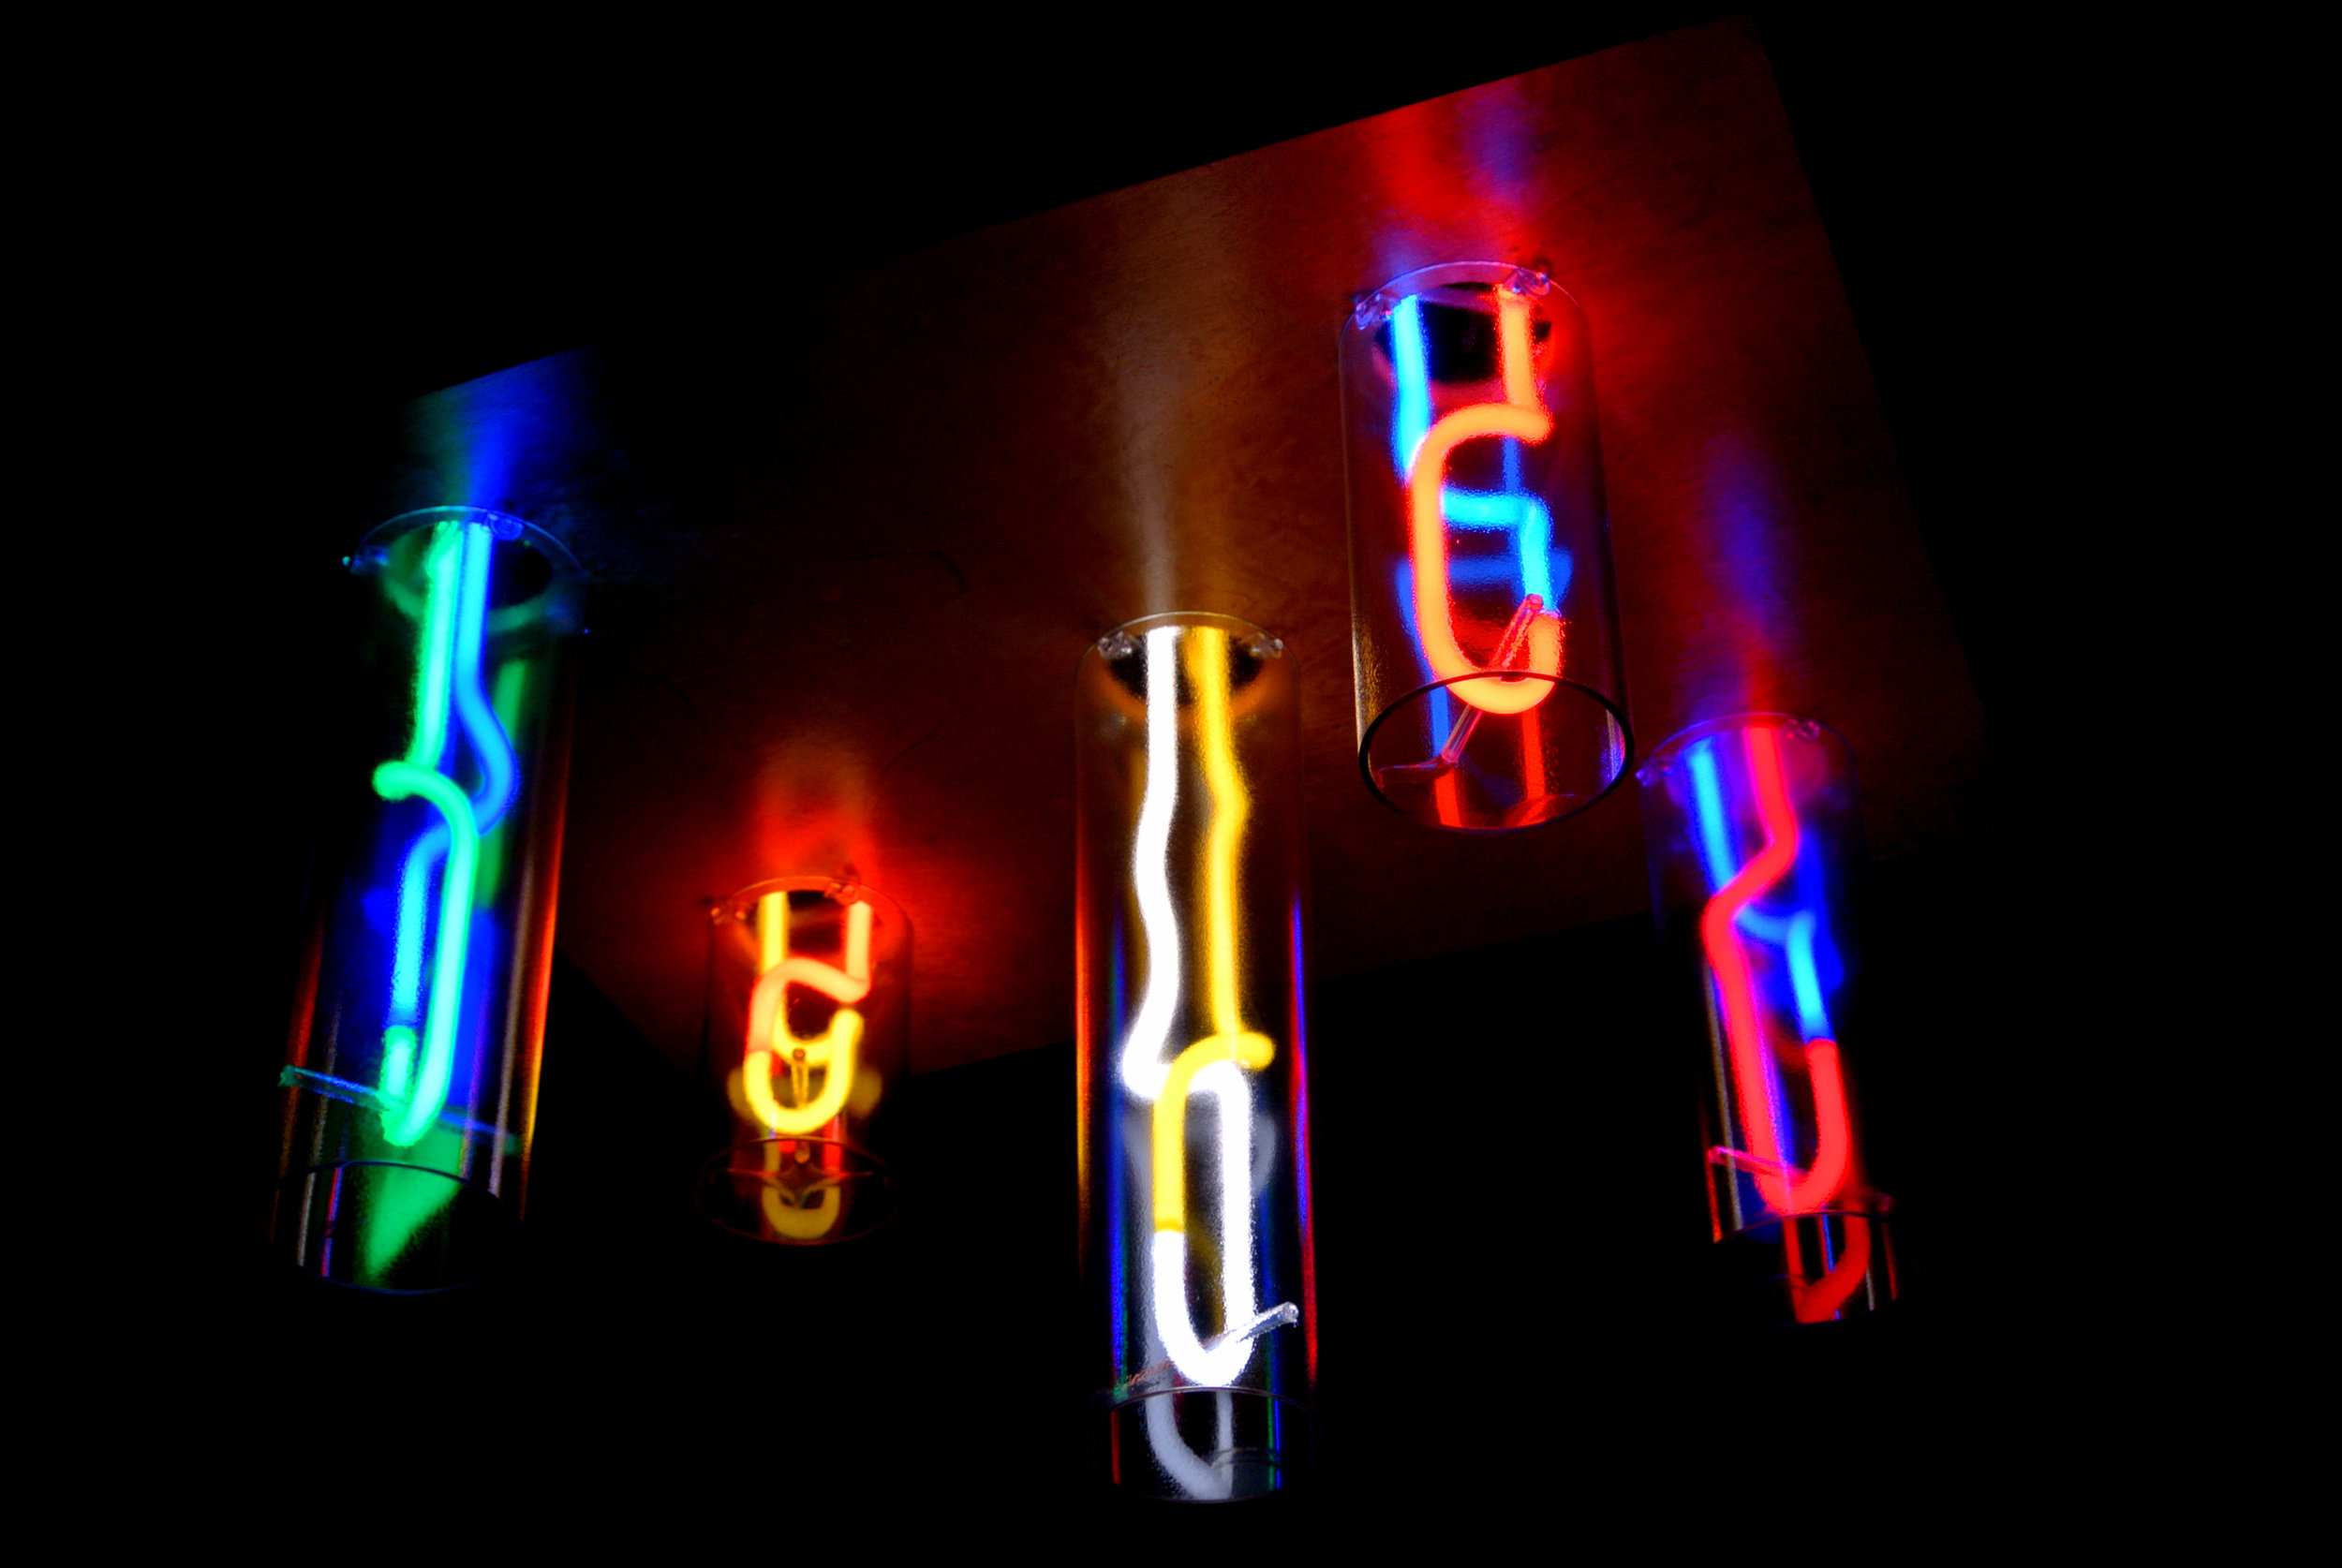 """ITALIAN CAVE ICICLES"" - Designer NEON LIGHT FIXTURE - by John Barton - BartonNeonMagic.com"